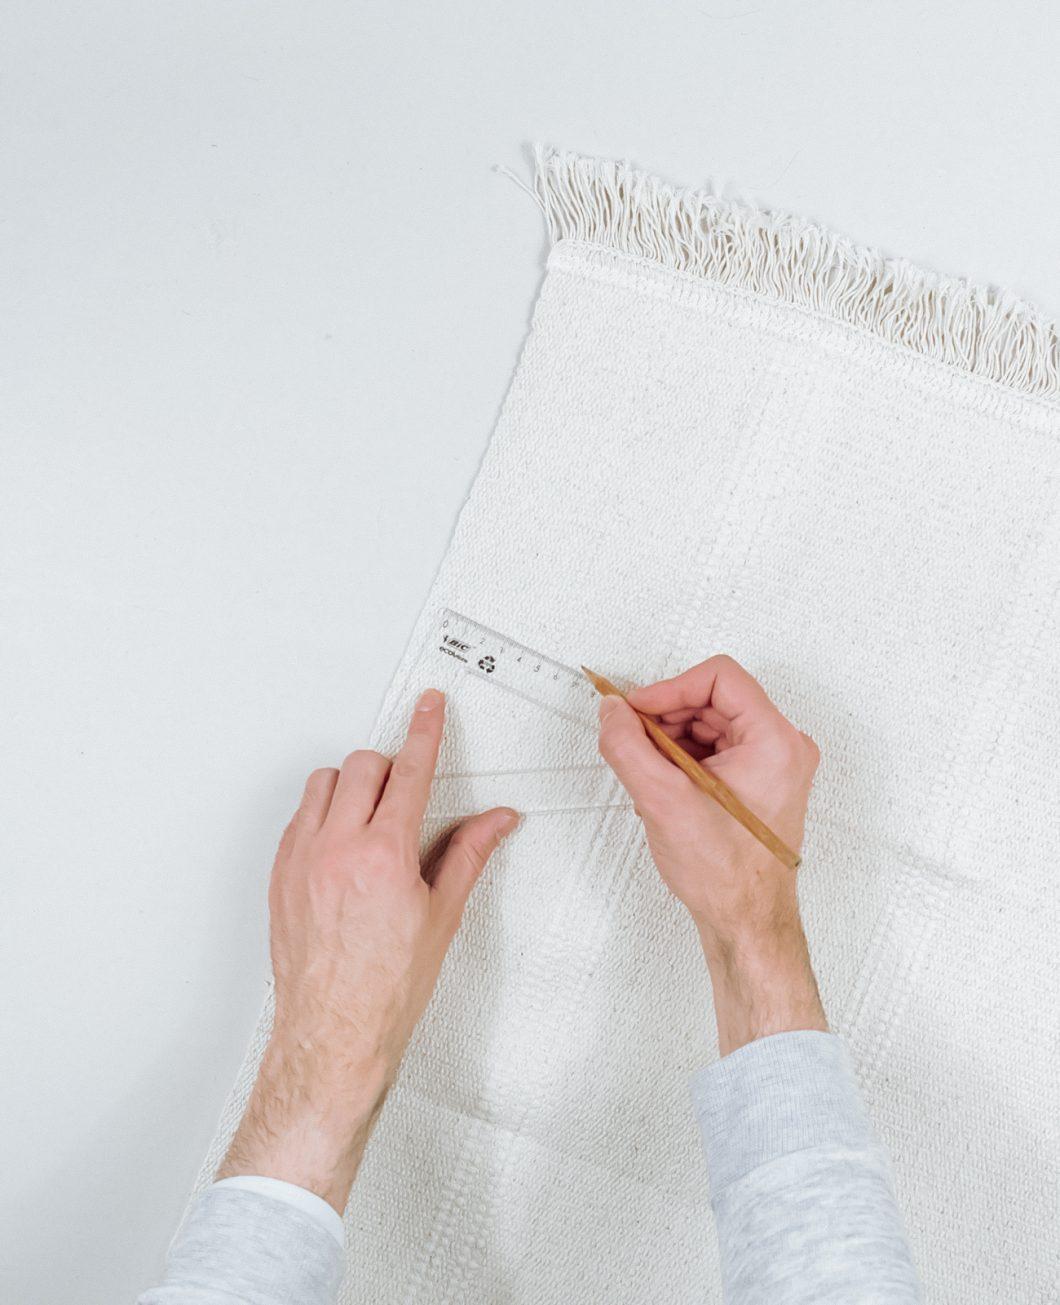 tapis deco murale boheme broderie Ikea Hack tuto dia etape 1